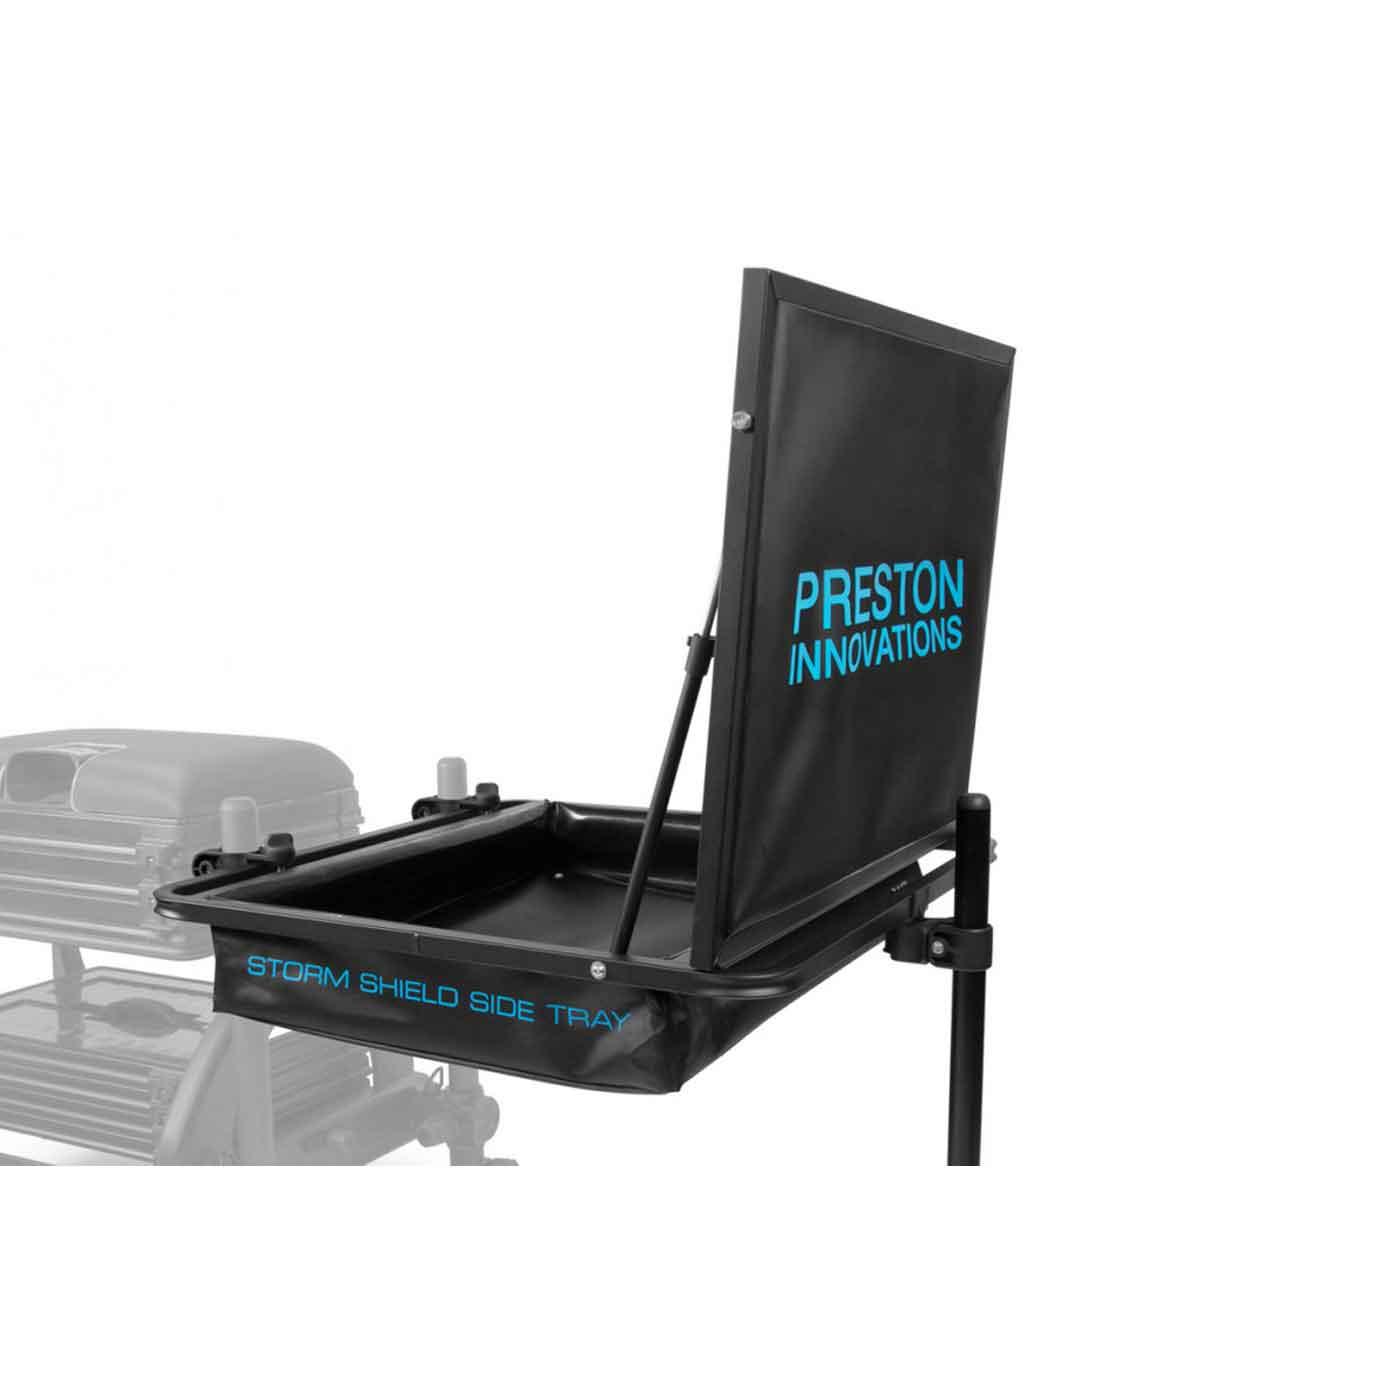 Preston Innovations Offbox 36 Storm Shield Tray *Brand New 2018*